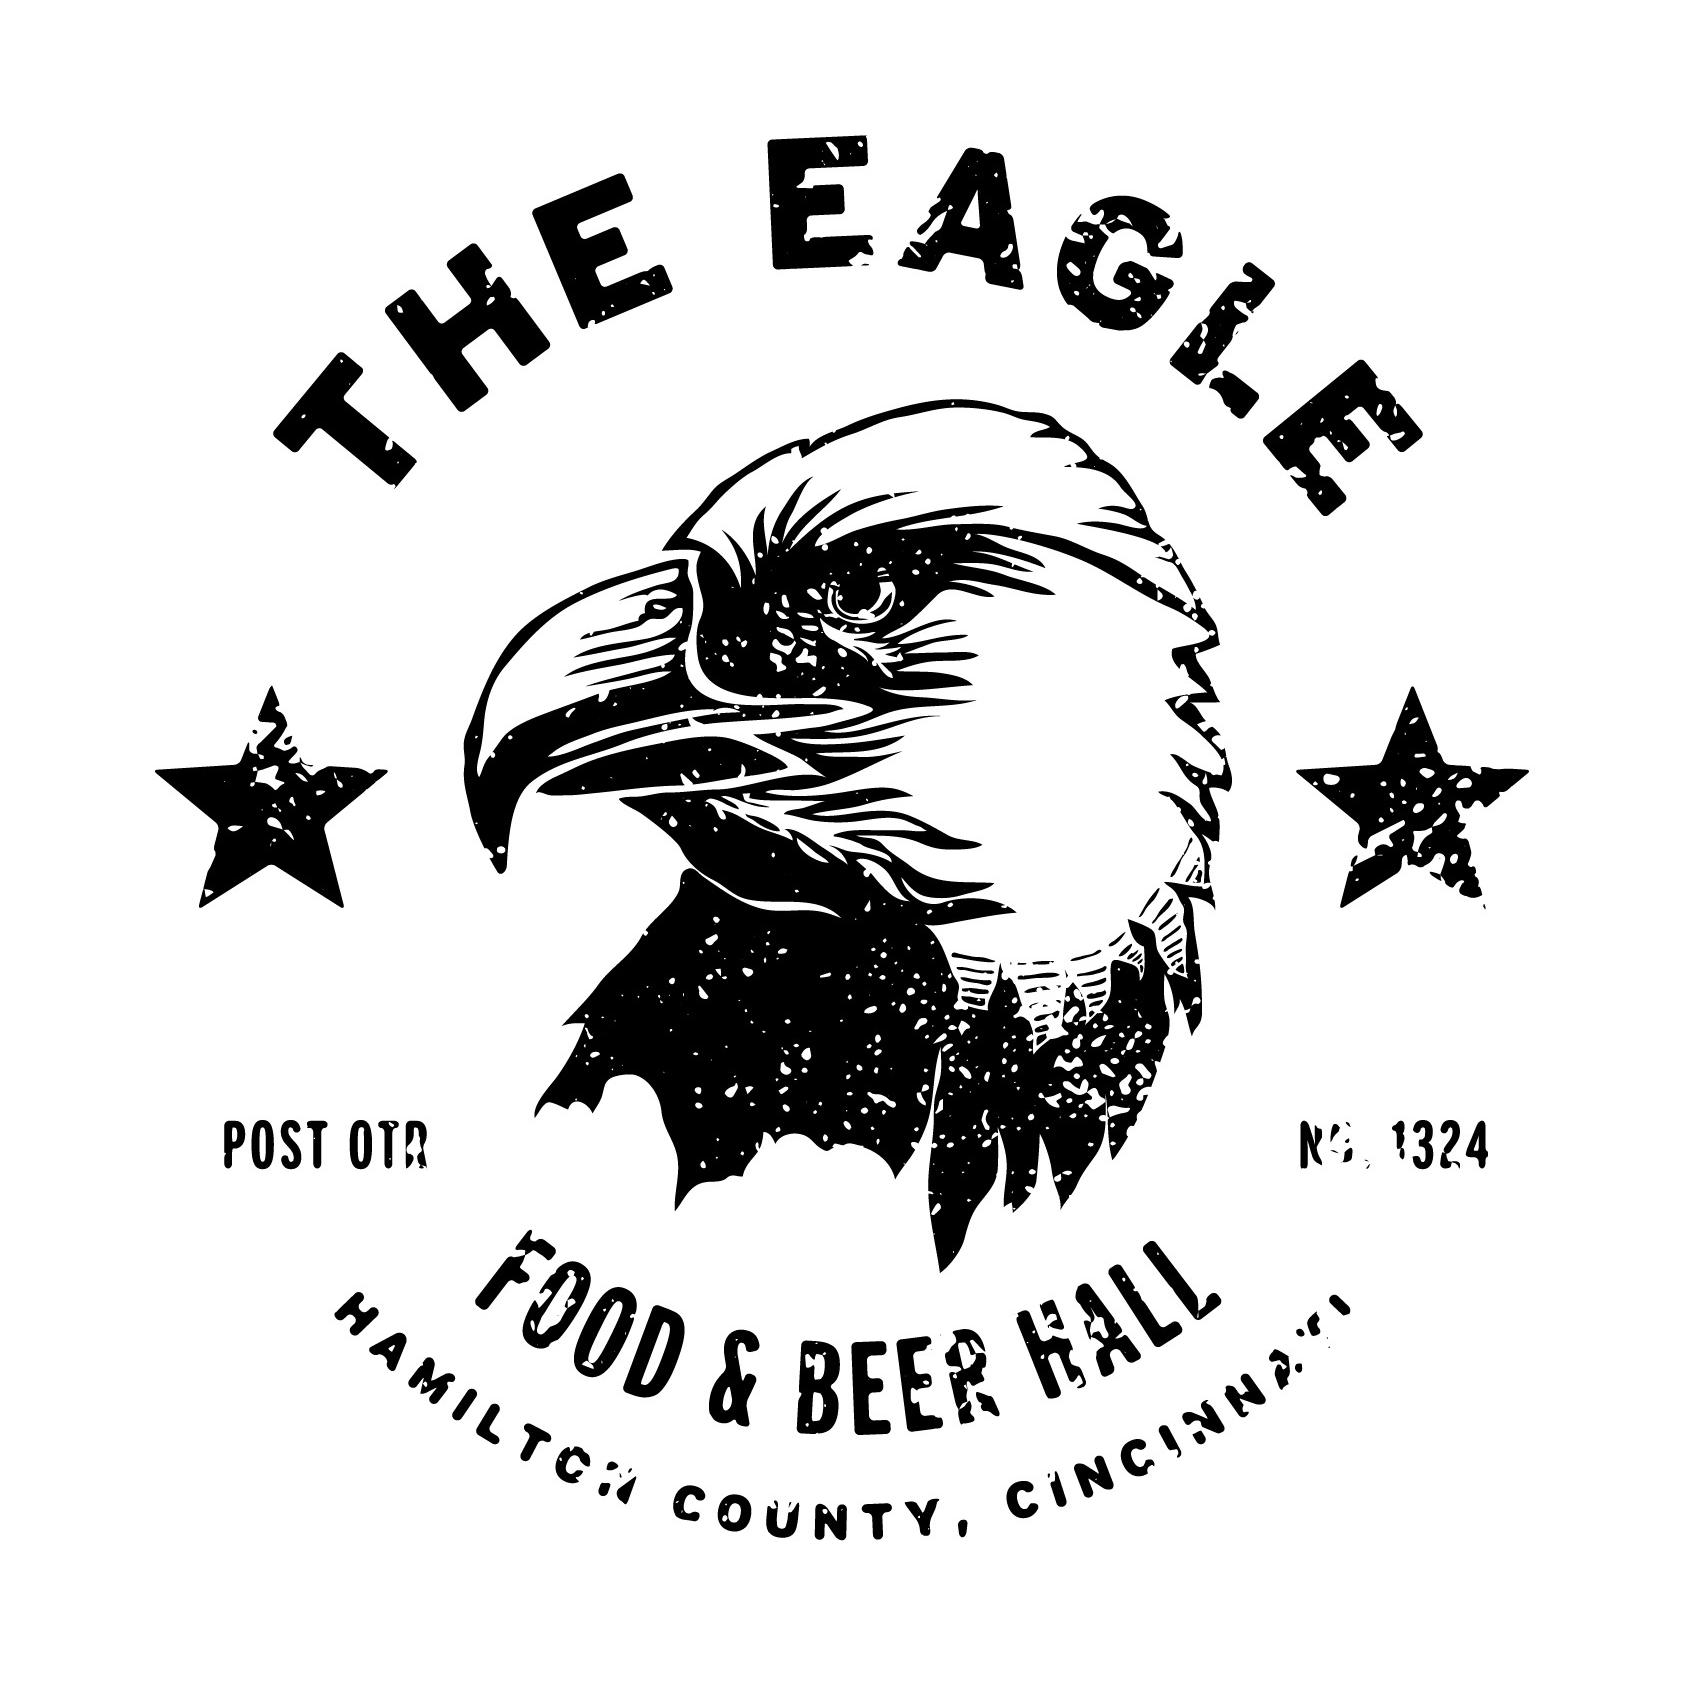 The Eagle OTR